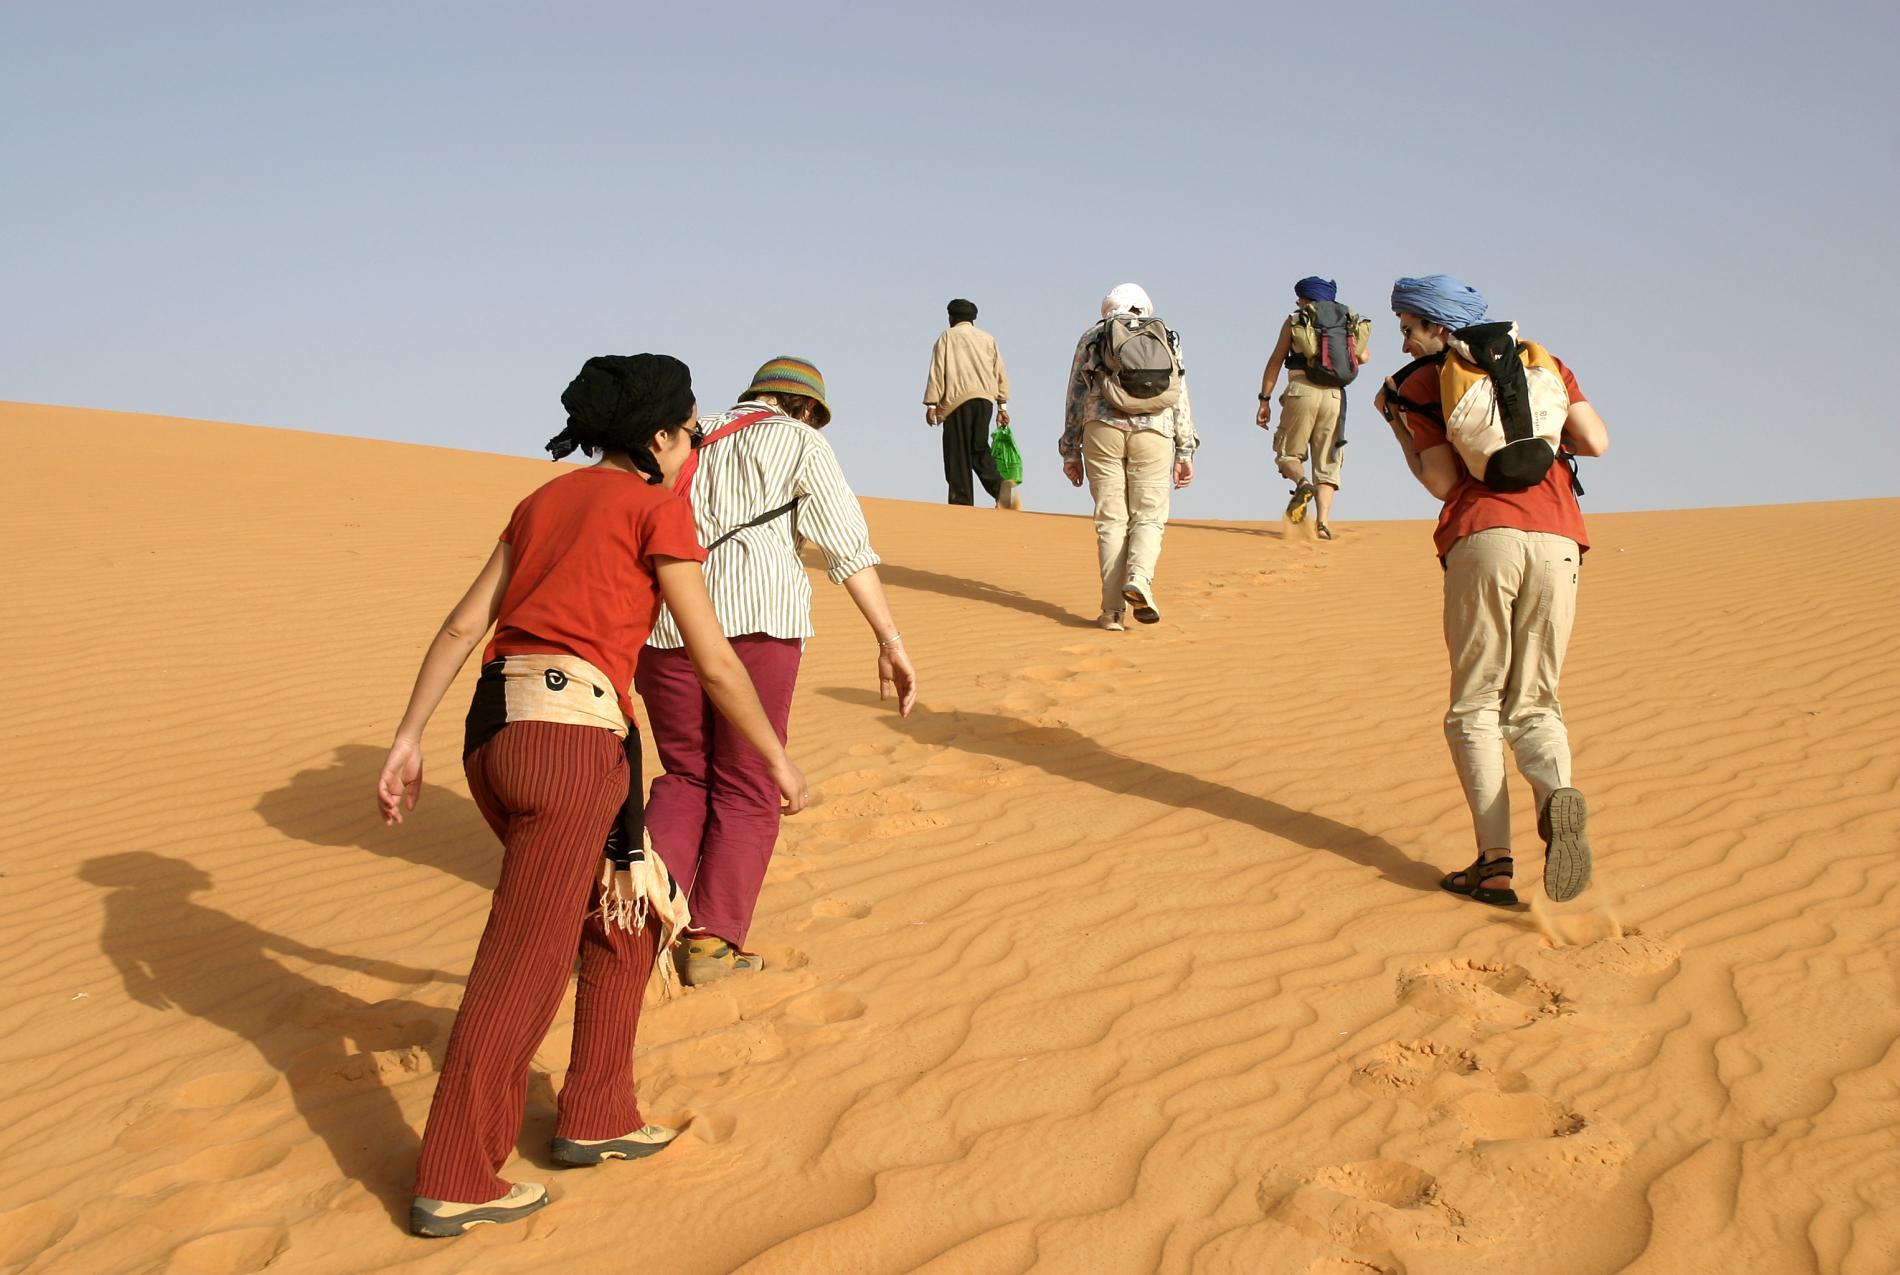 Voyage solidaire Mauritanie : Vision du Monde - Photo 8